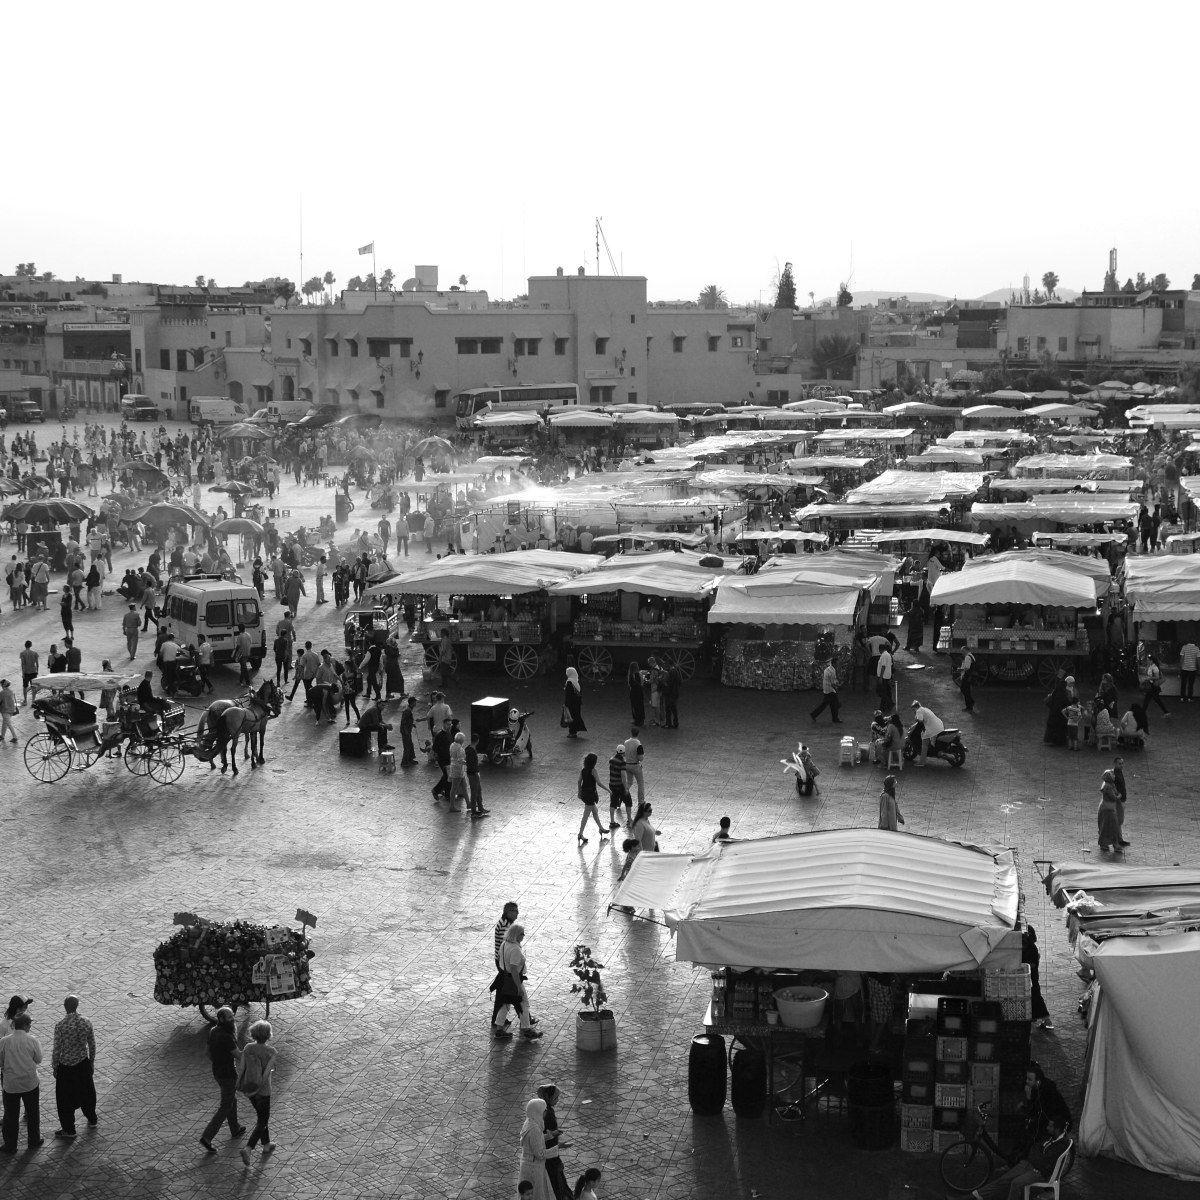 #freiheitsgefühle #reiseblog #weltreise #travel #backpacking #reisen #photography #urlaub #marrakesh #marokko #afrika #sommer #jamaelfna #souks #impressionen